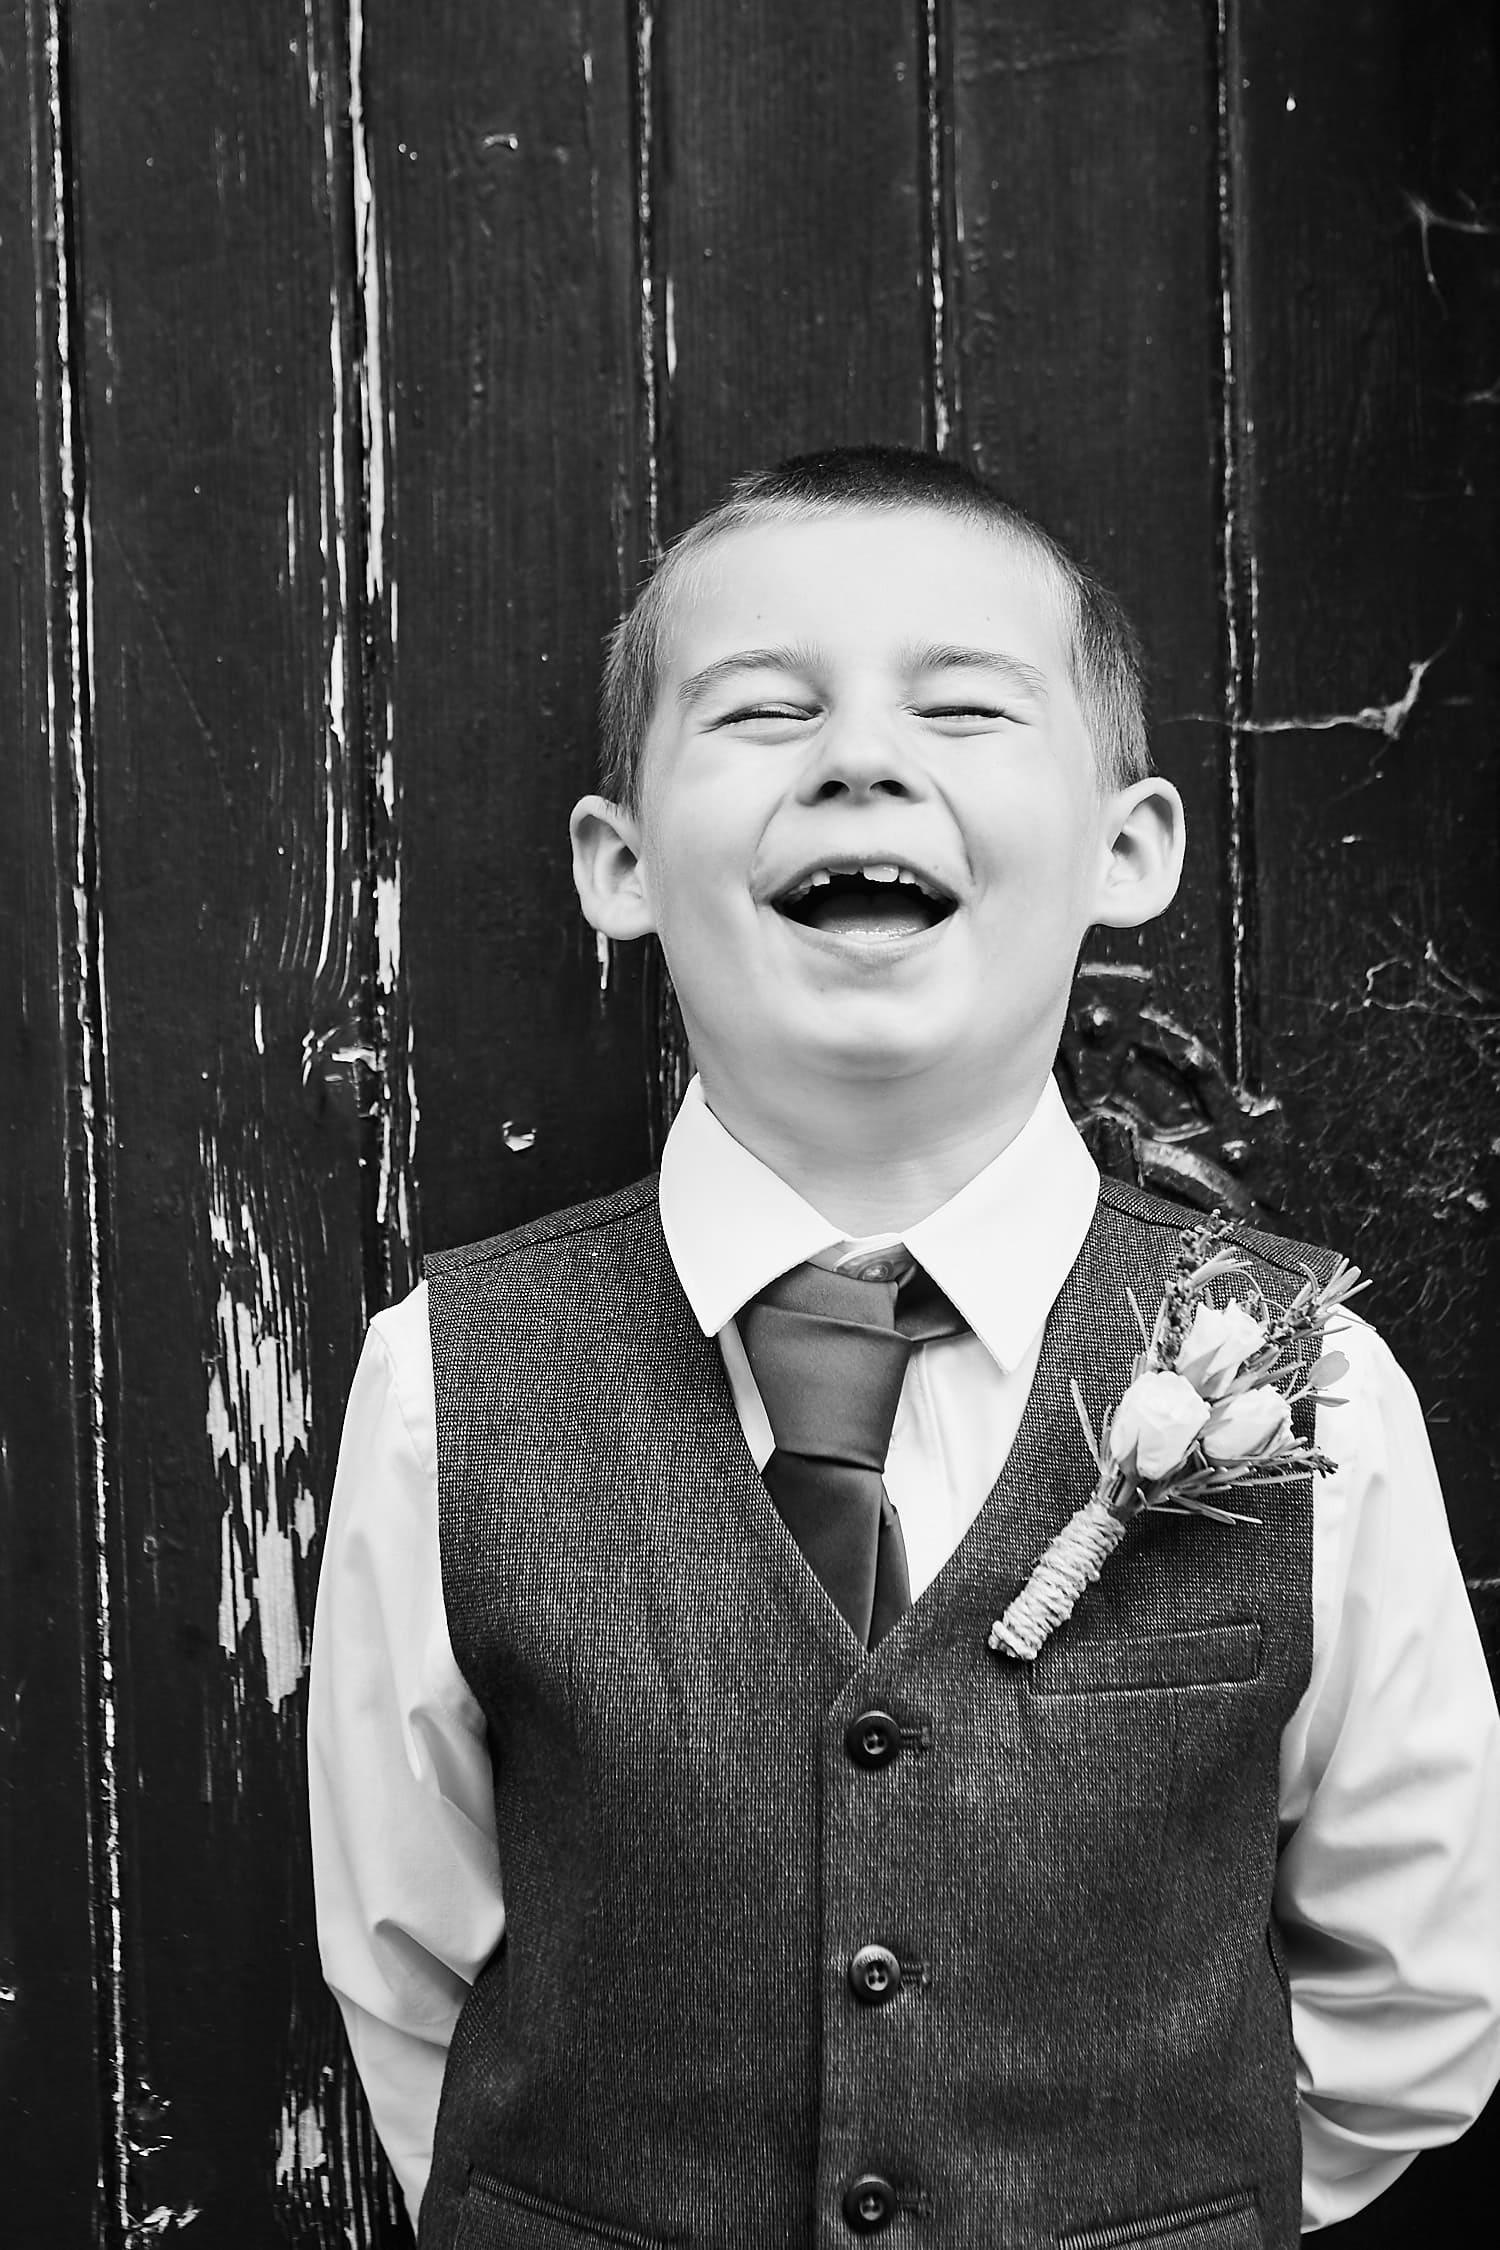 A page boy laughing at a joke